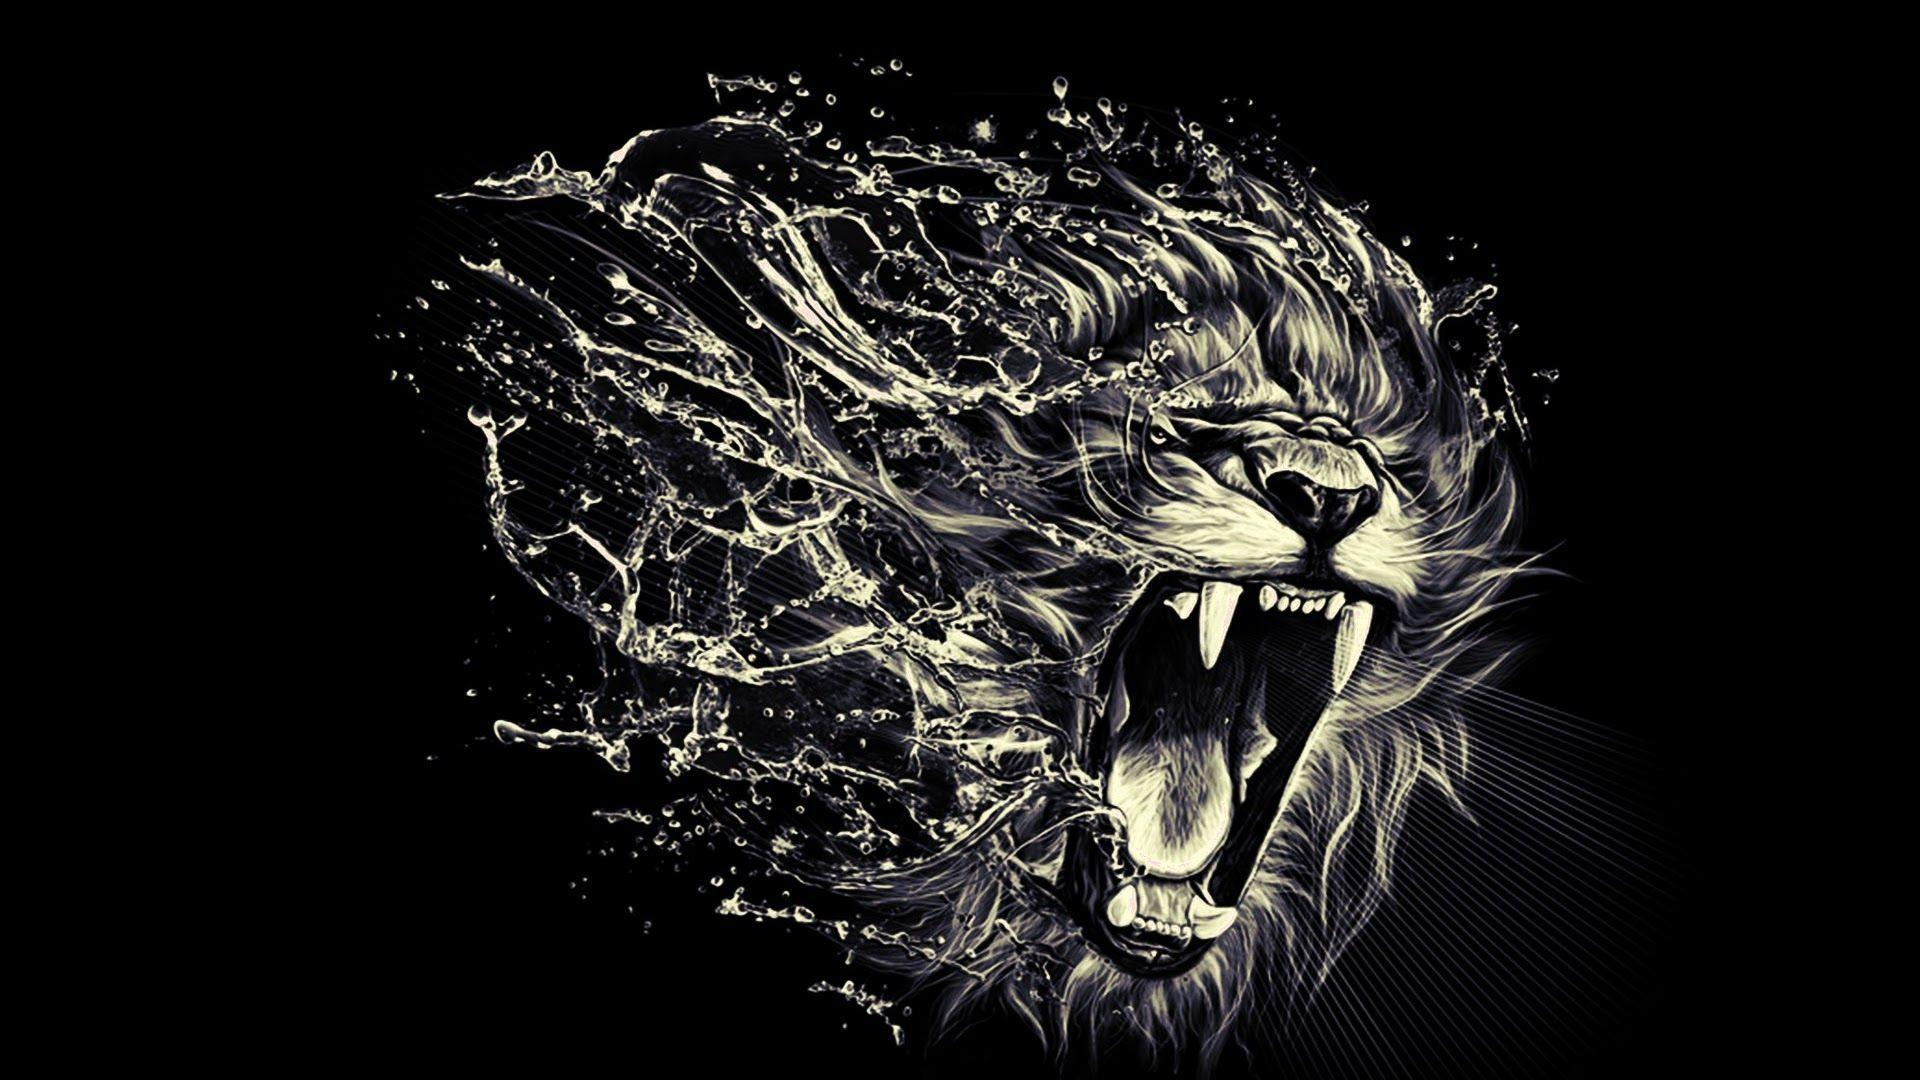 Roaring Lion Wallpapers - Wallpaper Cave